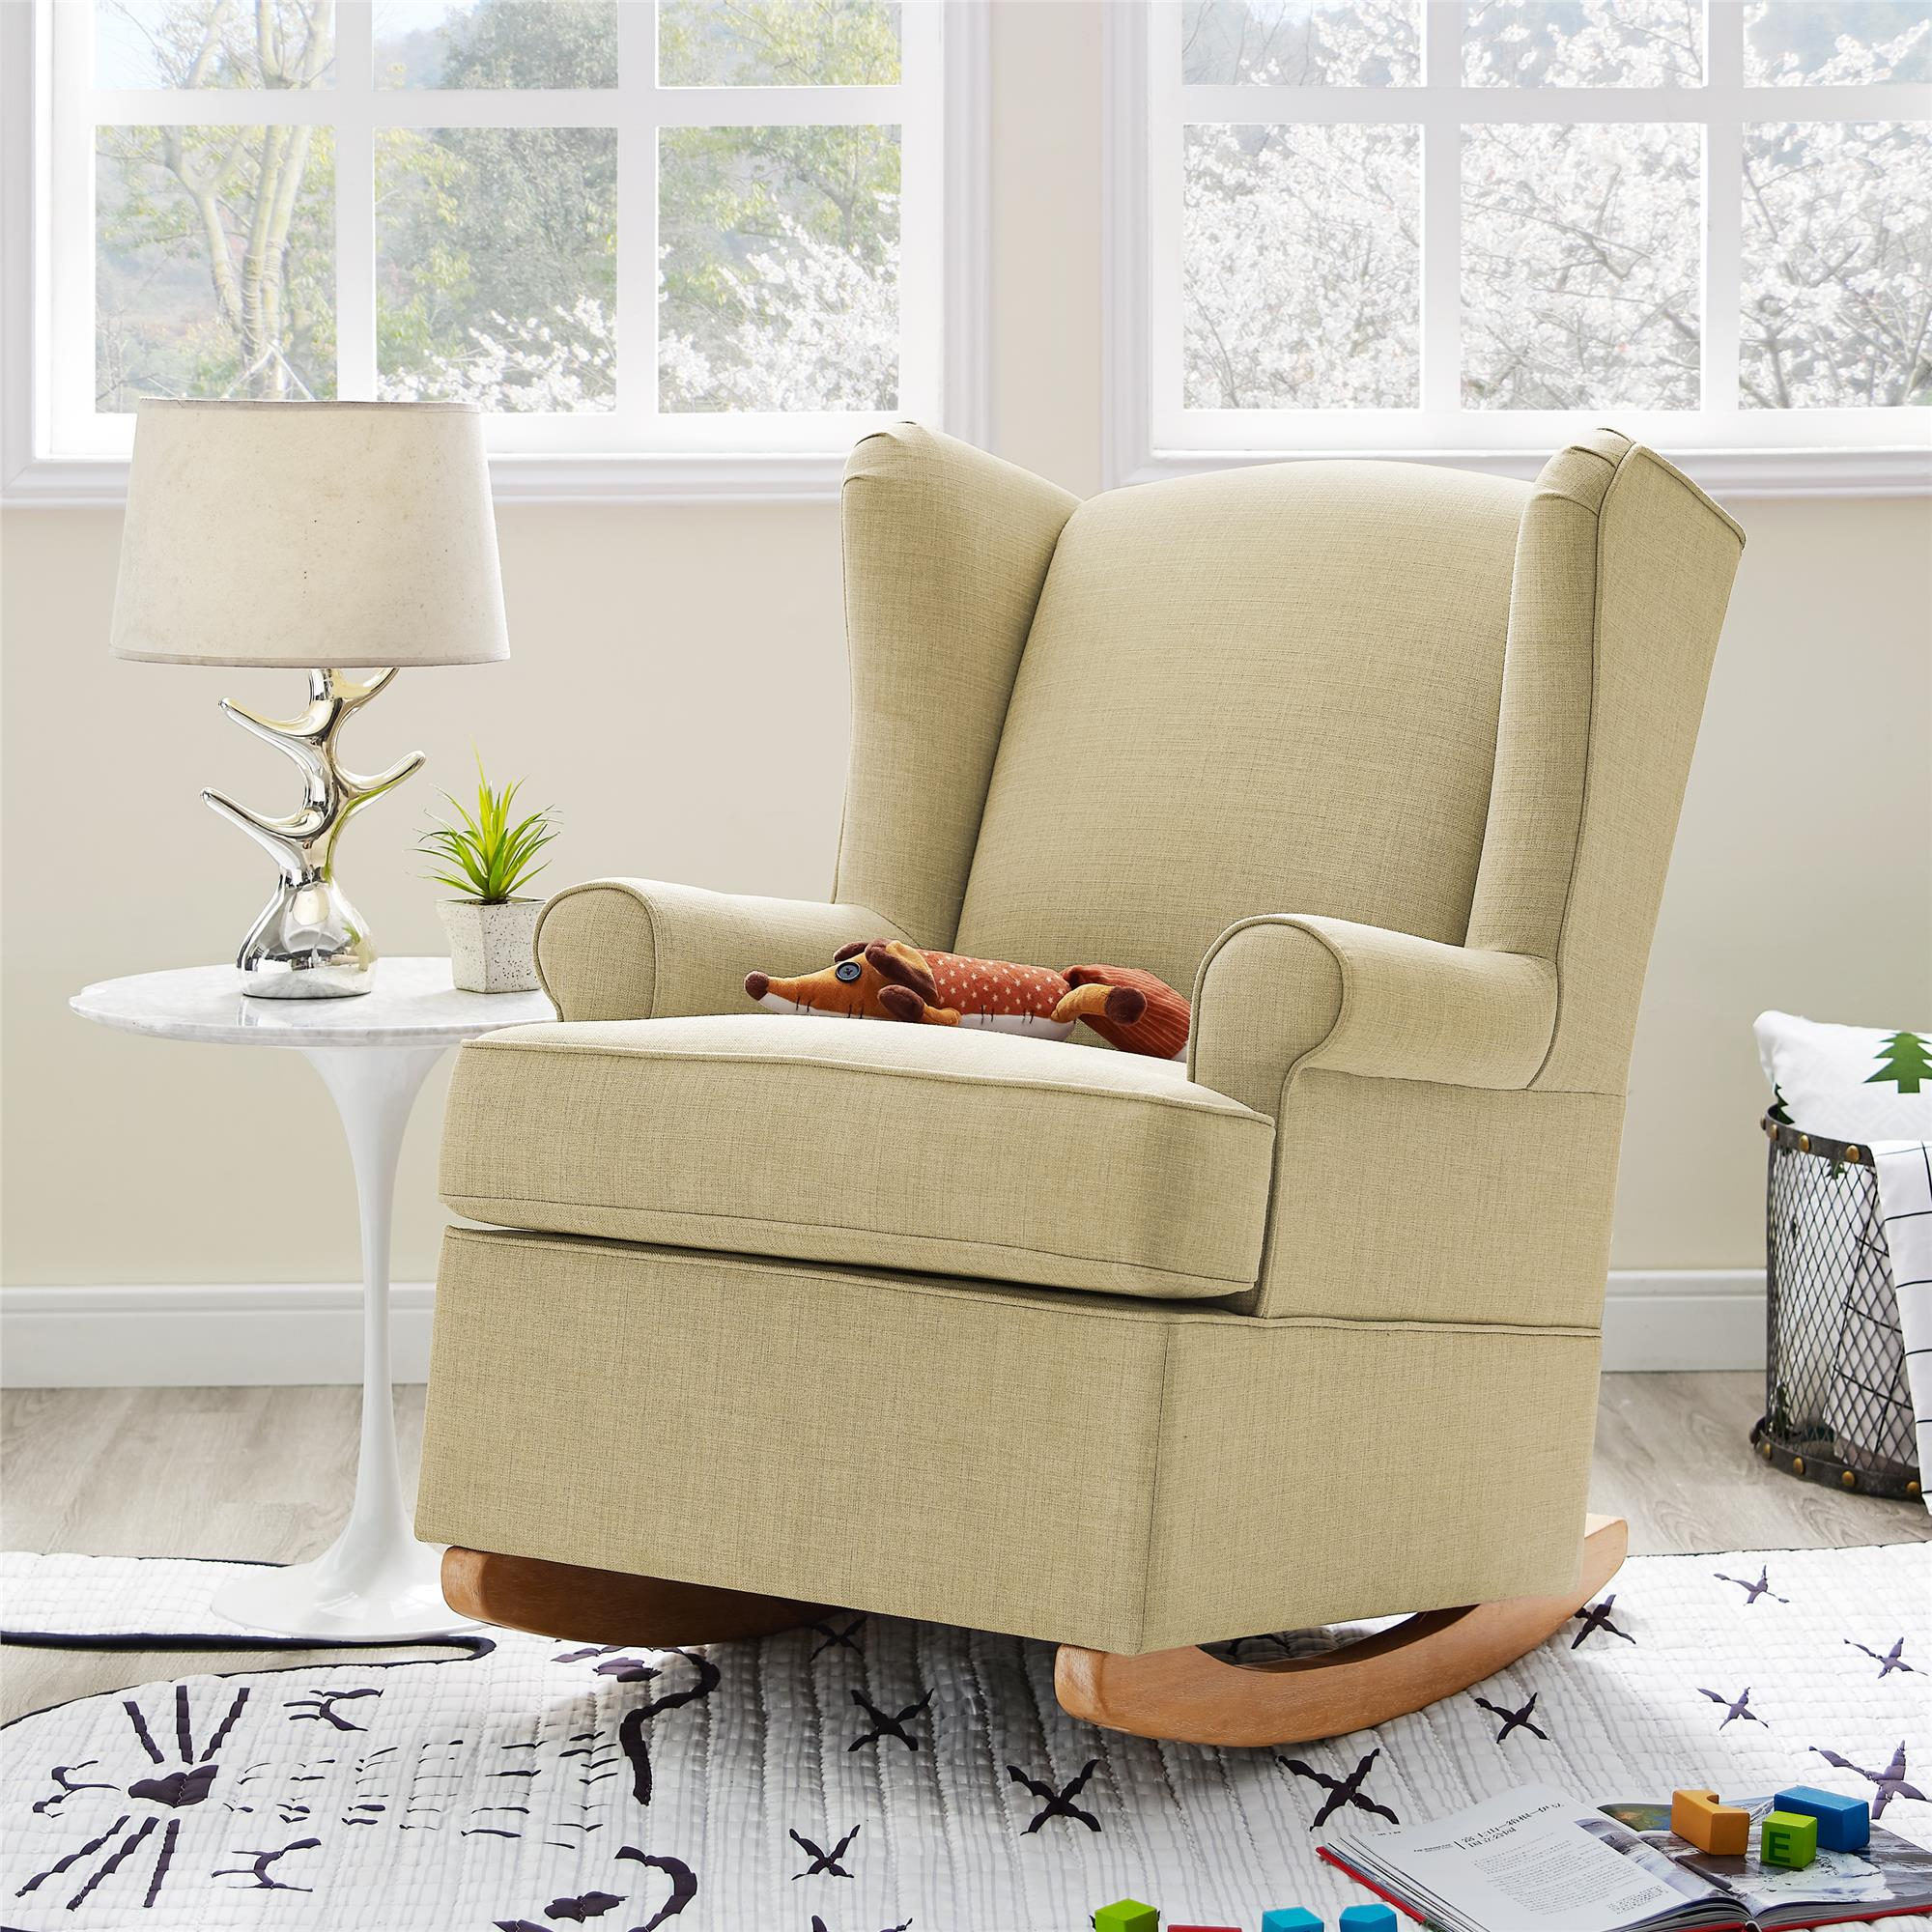 Dorel Living | Baby Relax Brennan Wingback Convertible Rocker, Beige Inside Brennan Sofa Chairs (Image 10 of 25)